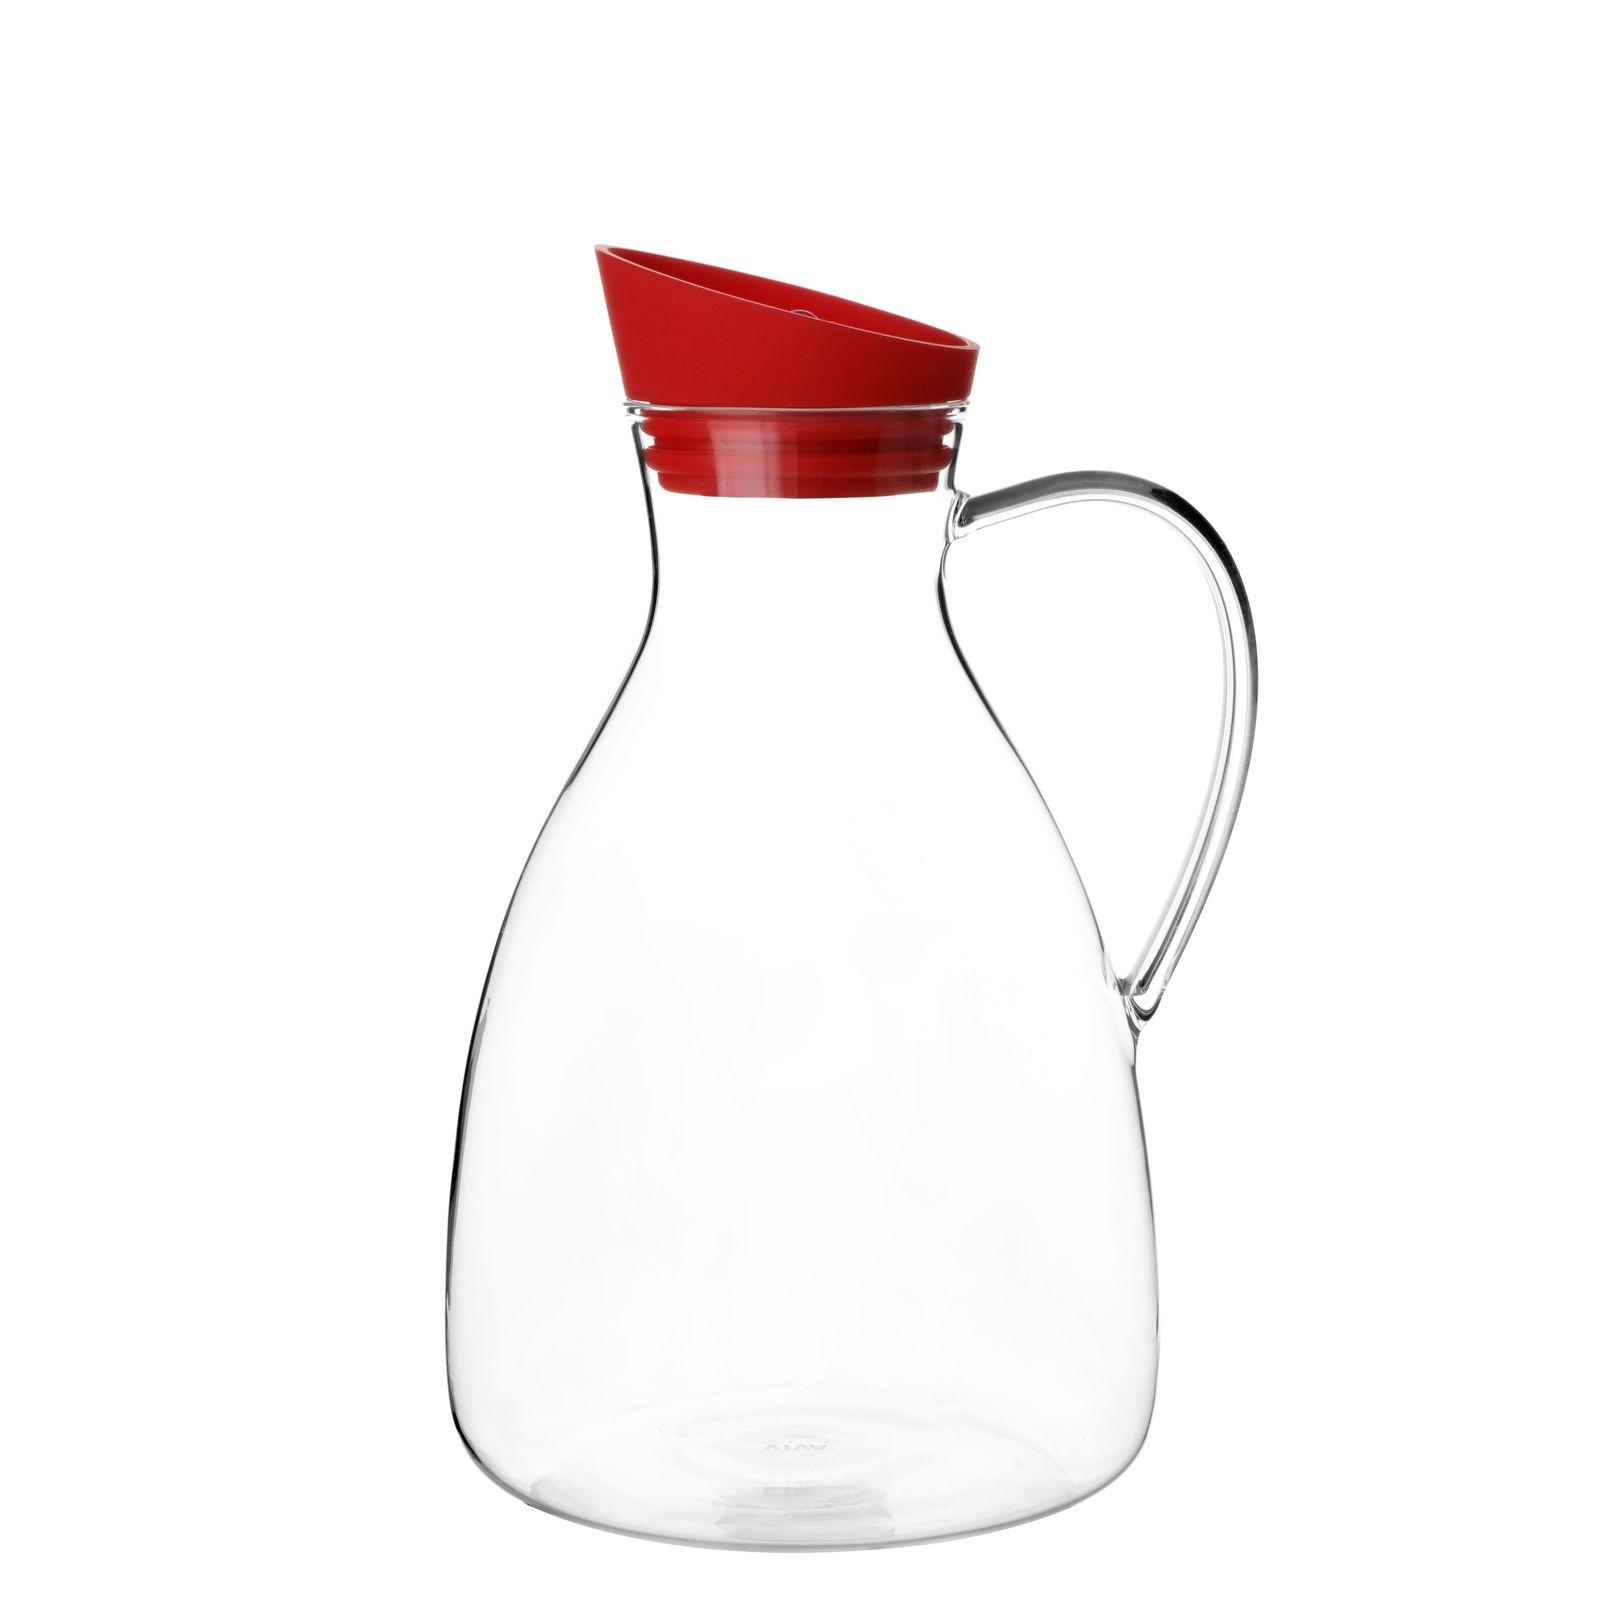 Viva Infusion Karaf 2,4 liter